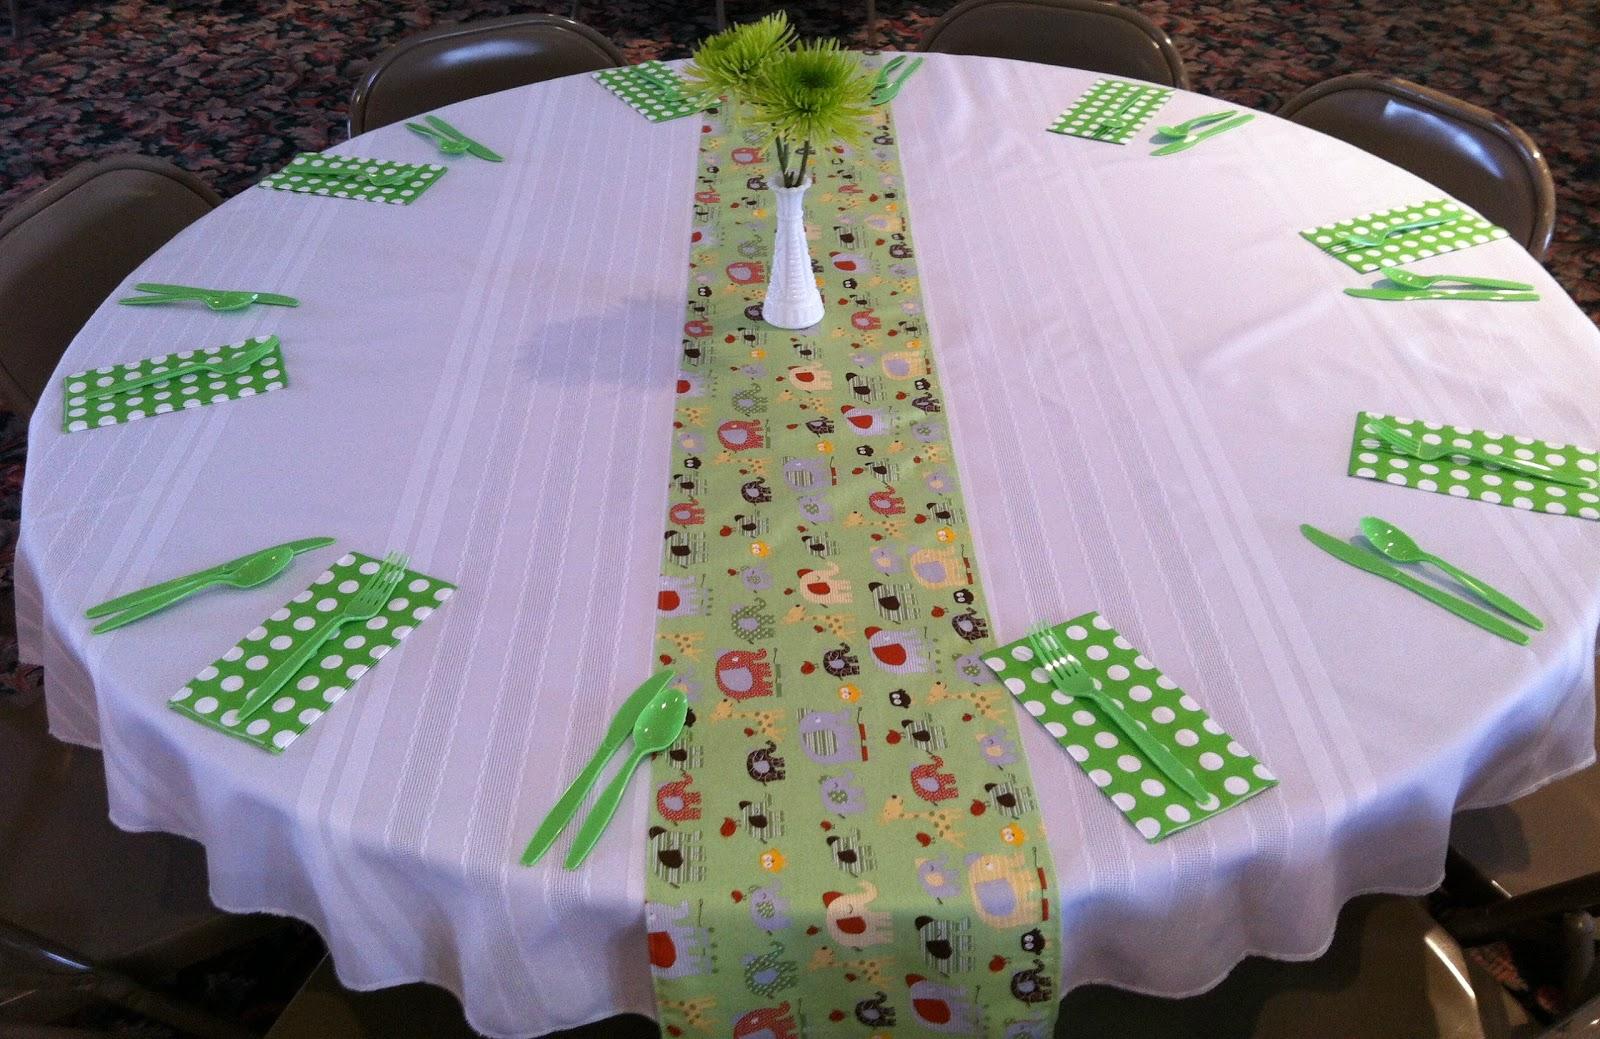 Baby Bear Necessities: Gender Neutral Baby Shower Decorations